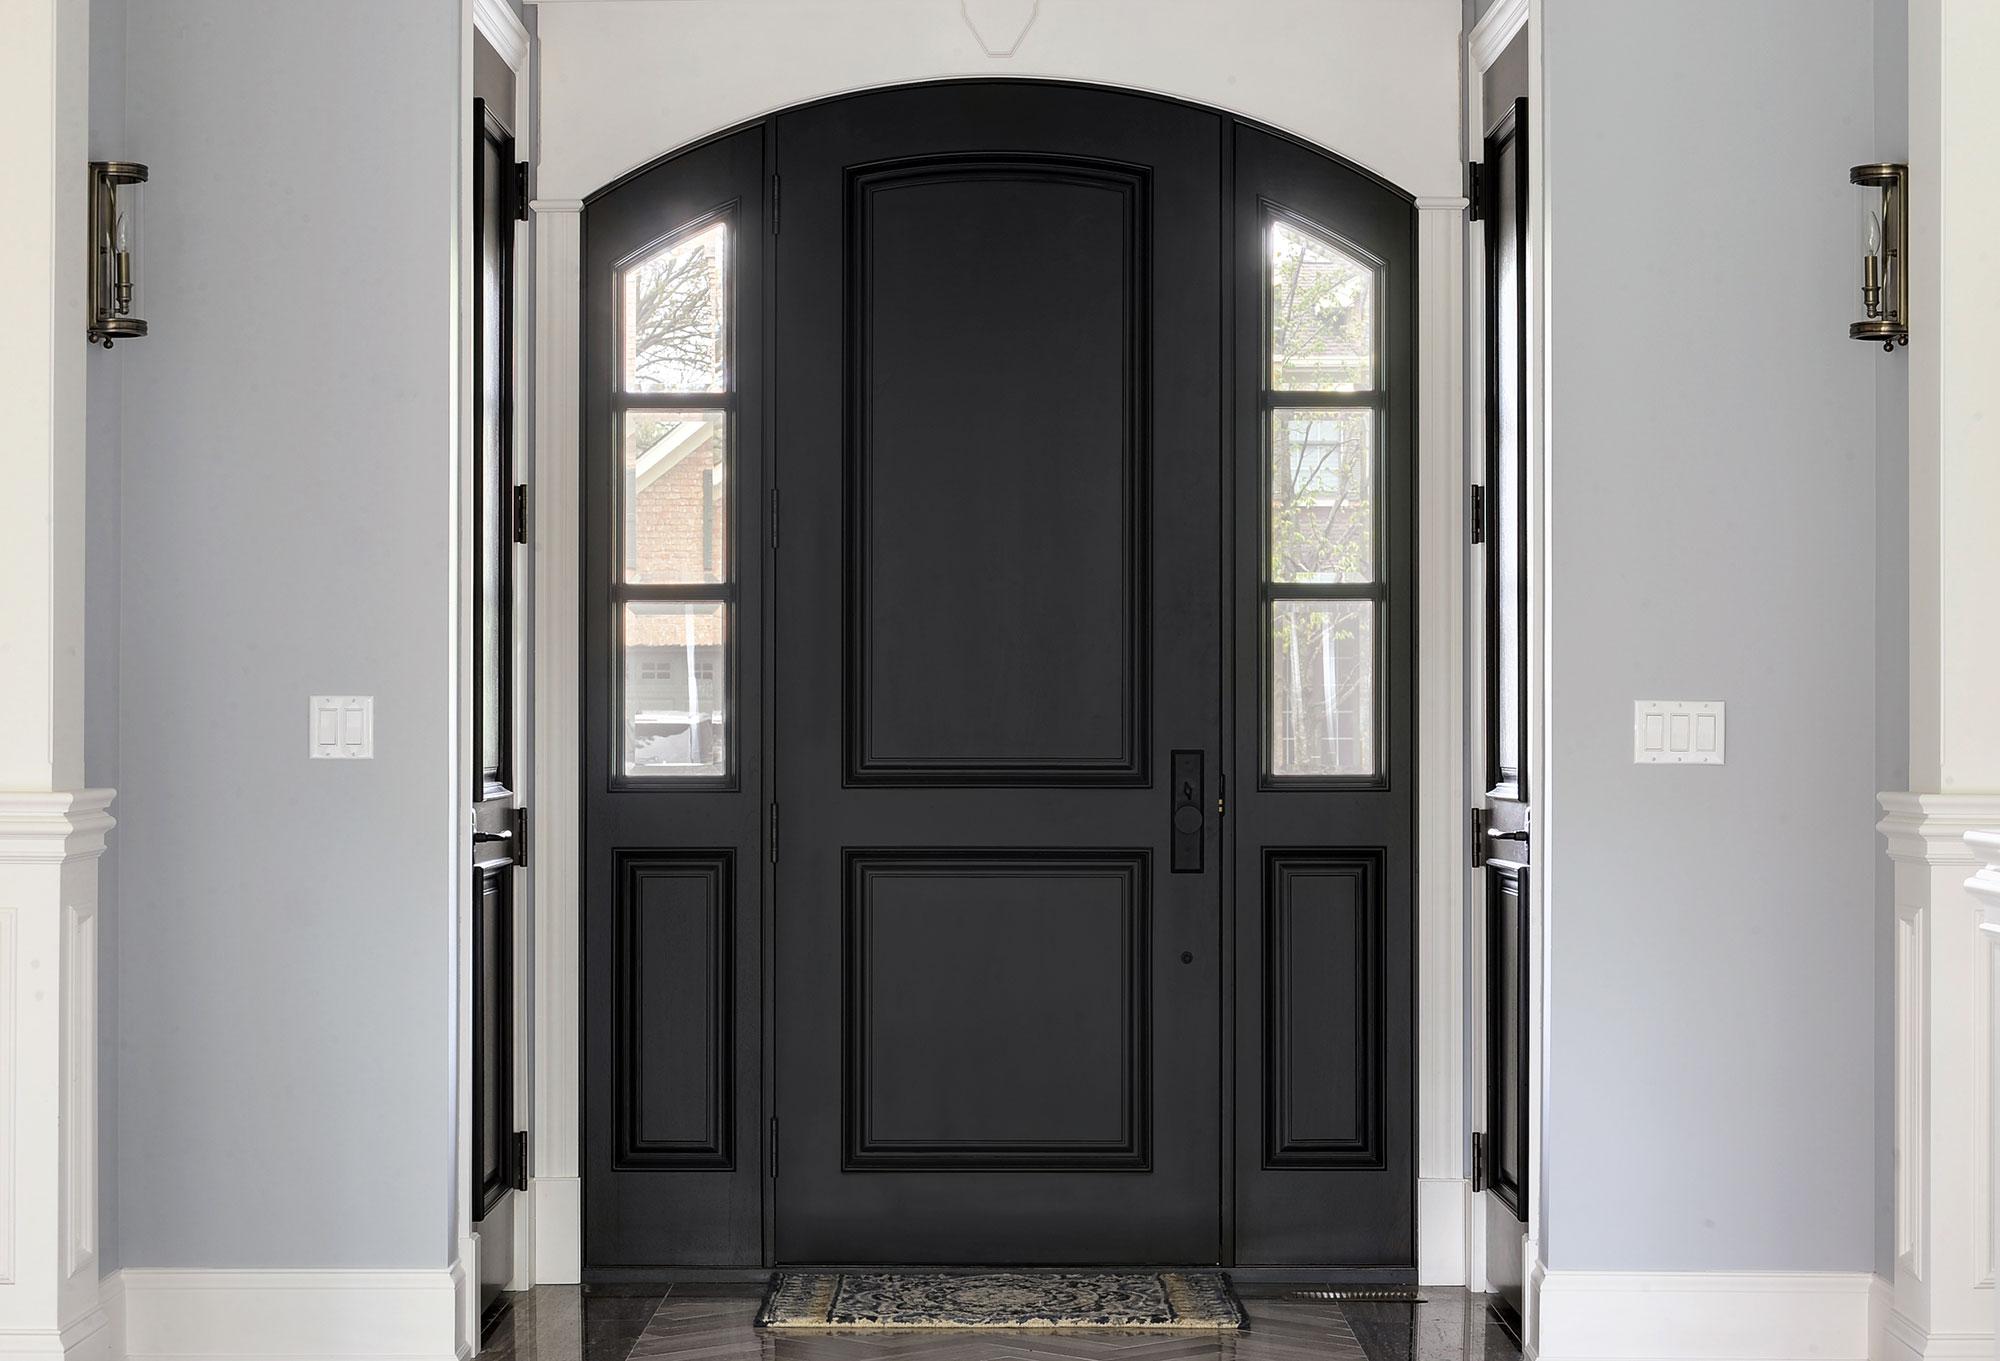 100 custom home interior craftsman home builders in virginia beach virginia jm froehler - Custom home interior ...